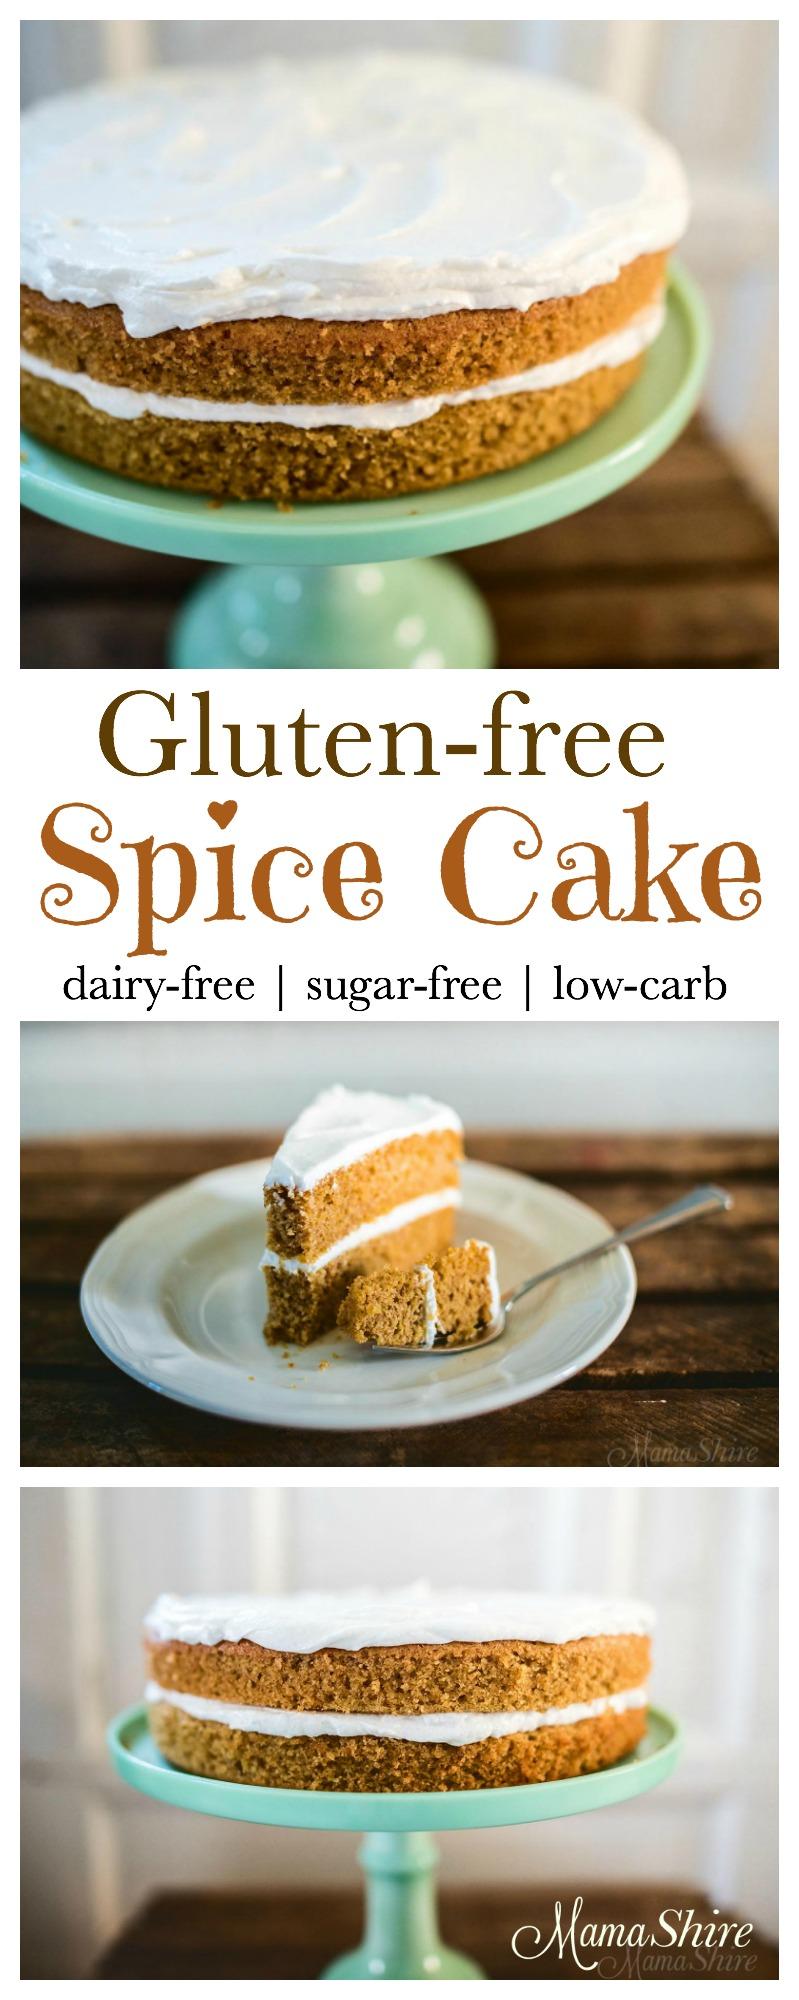 Gluten-Free Spice Cake - Dairy-free, sugar-free